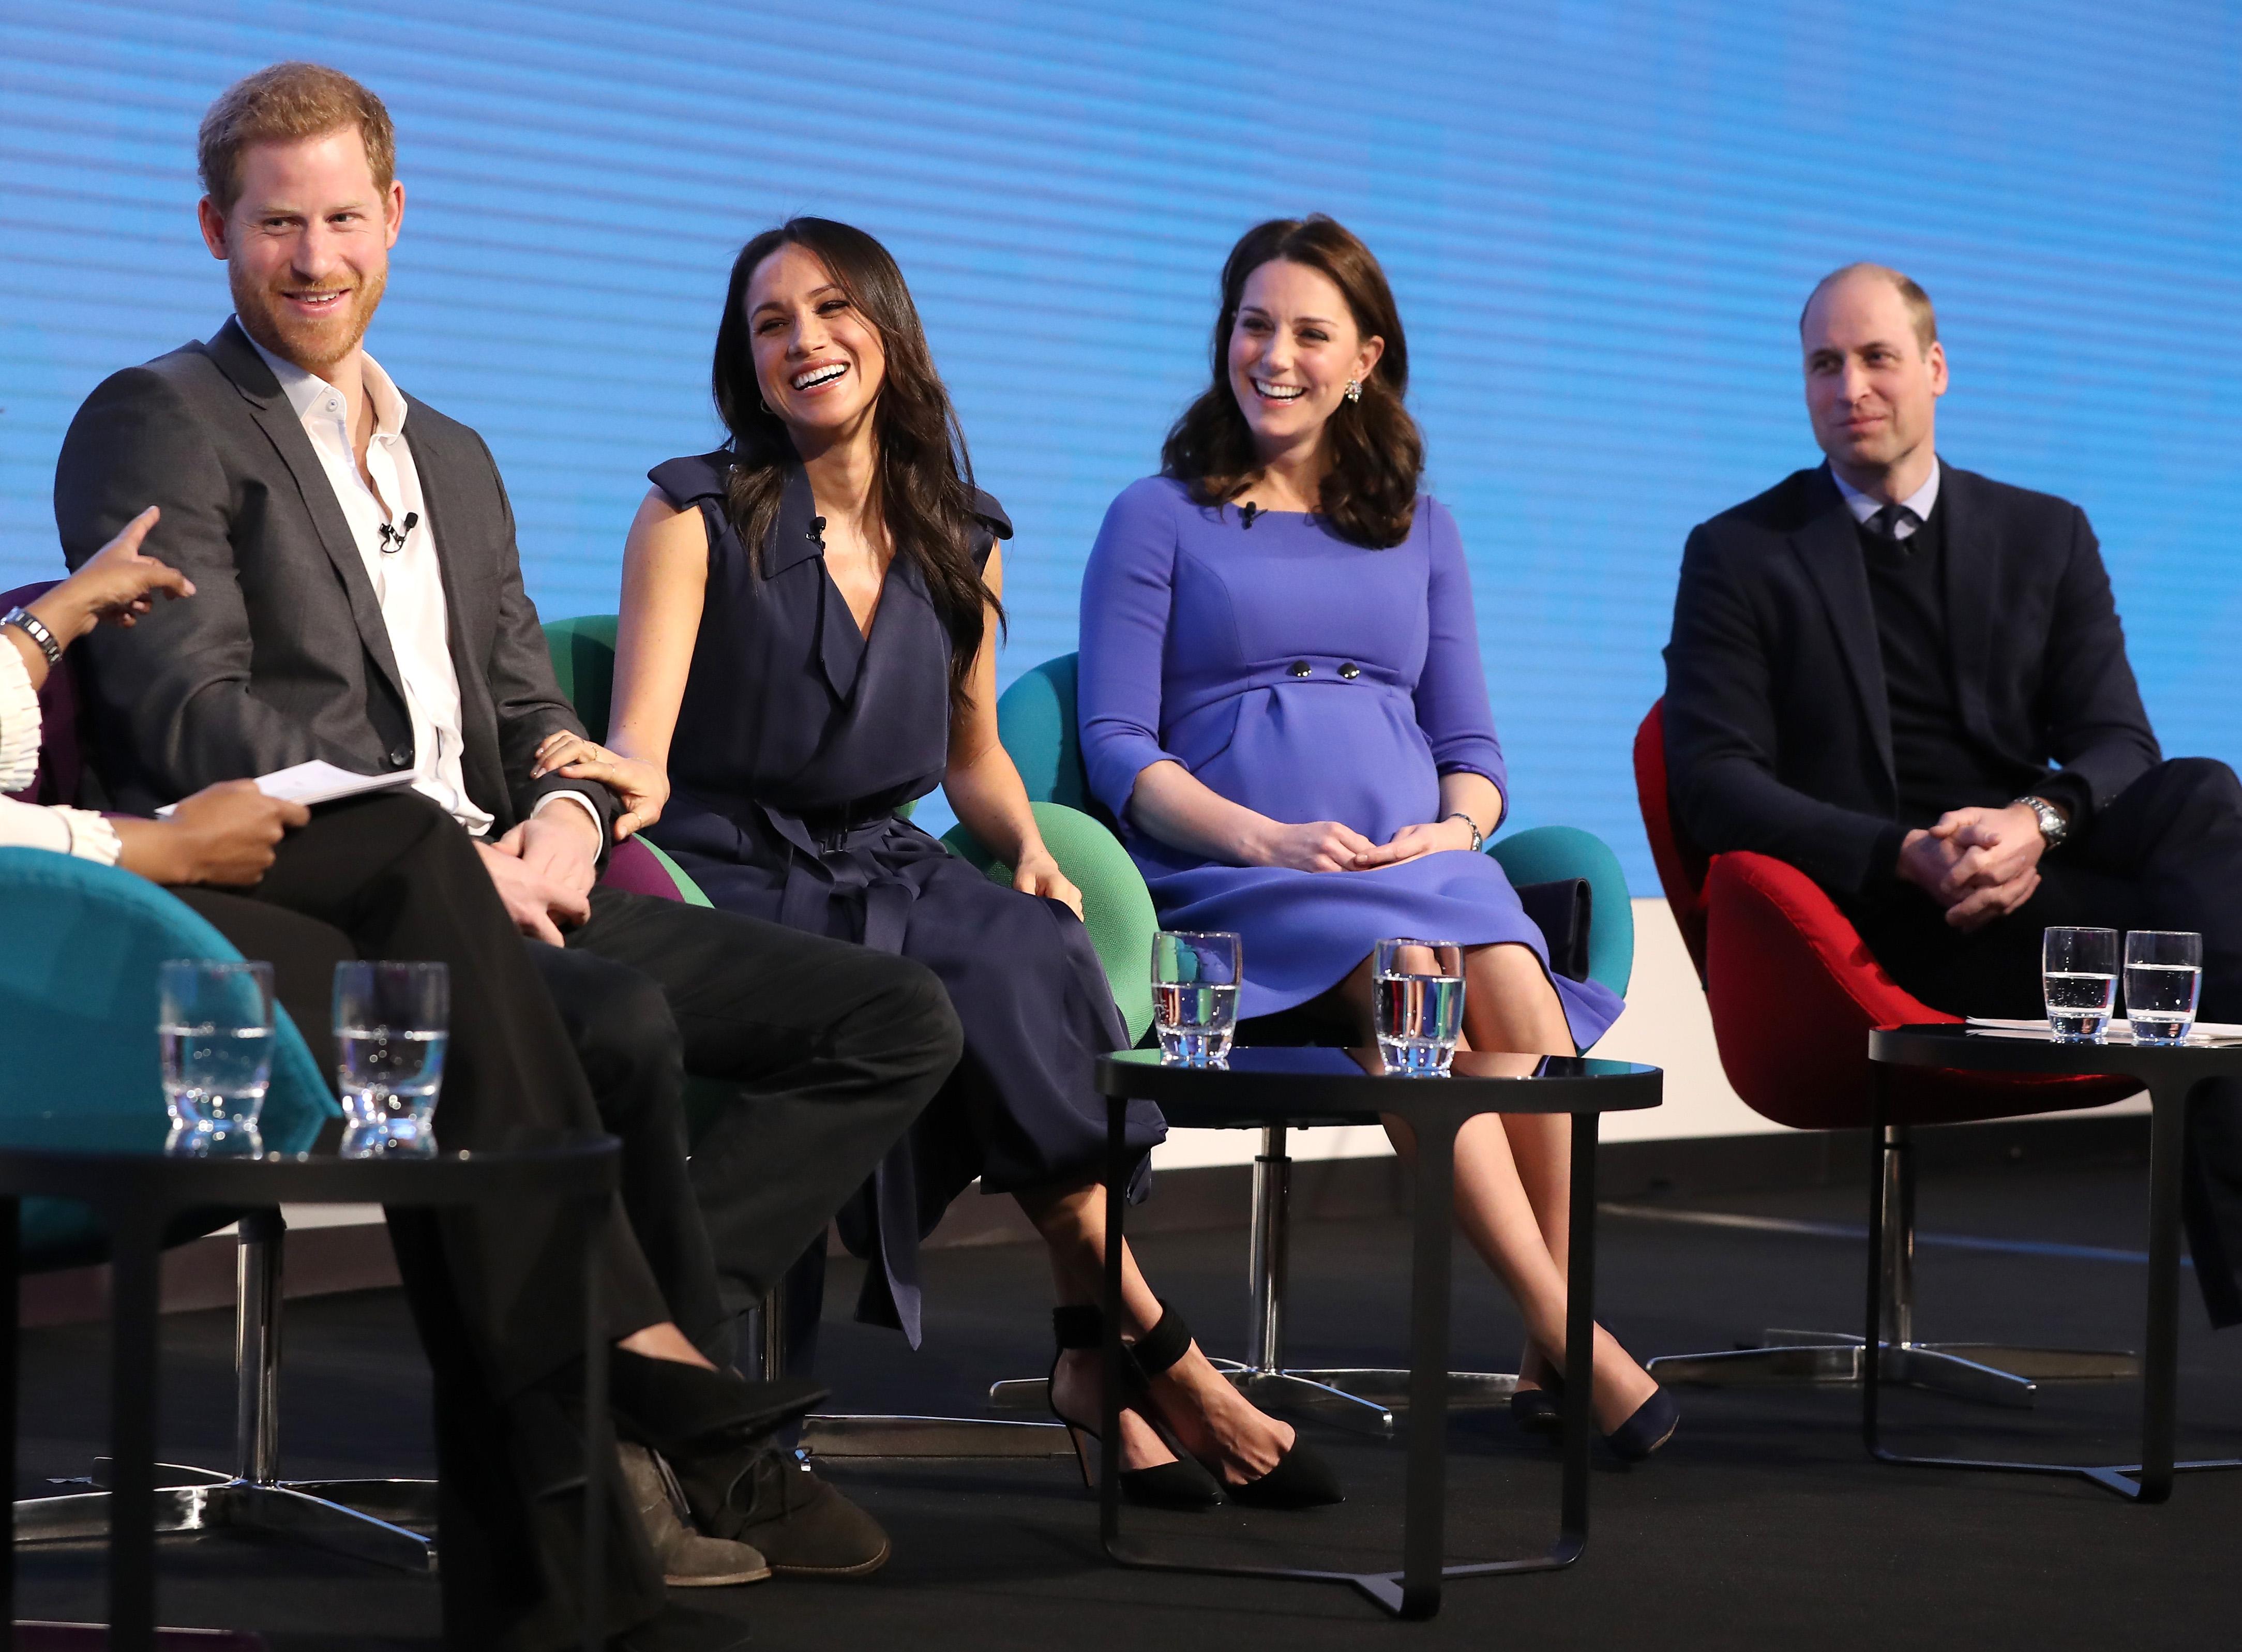 Prince Harry, Meghan Markle, Kate Middleton, Prince William,